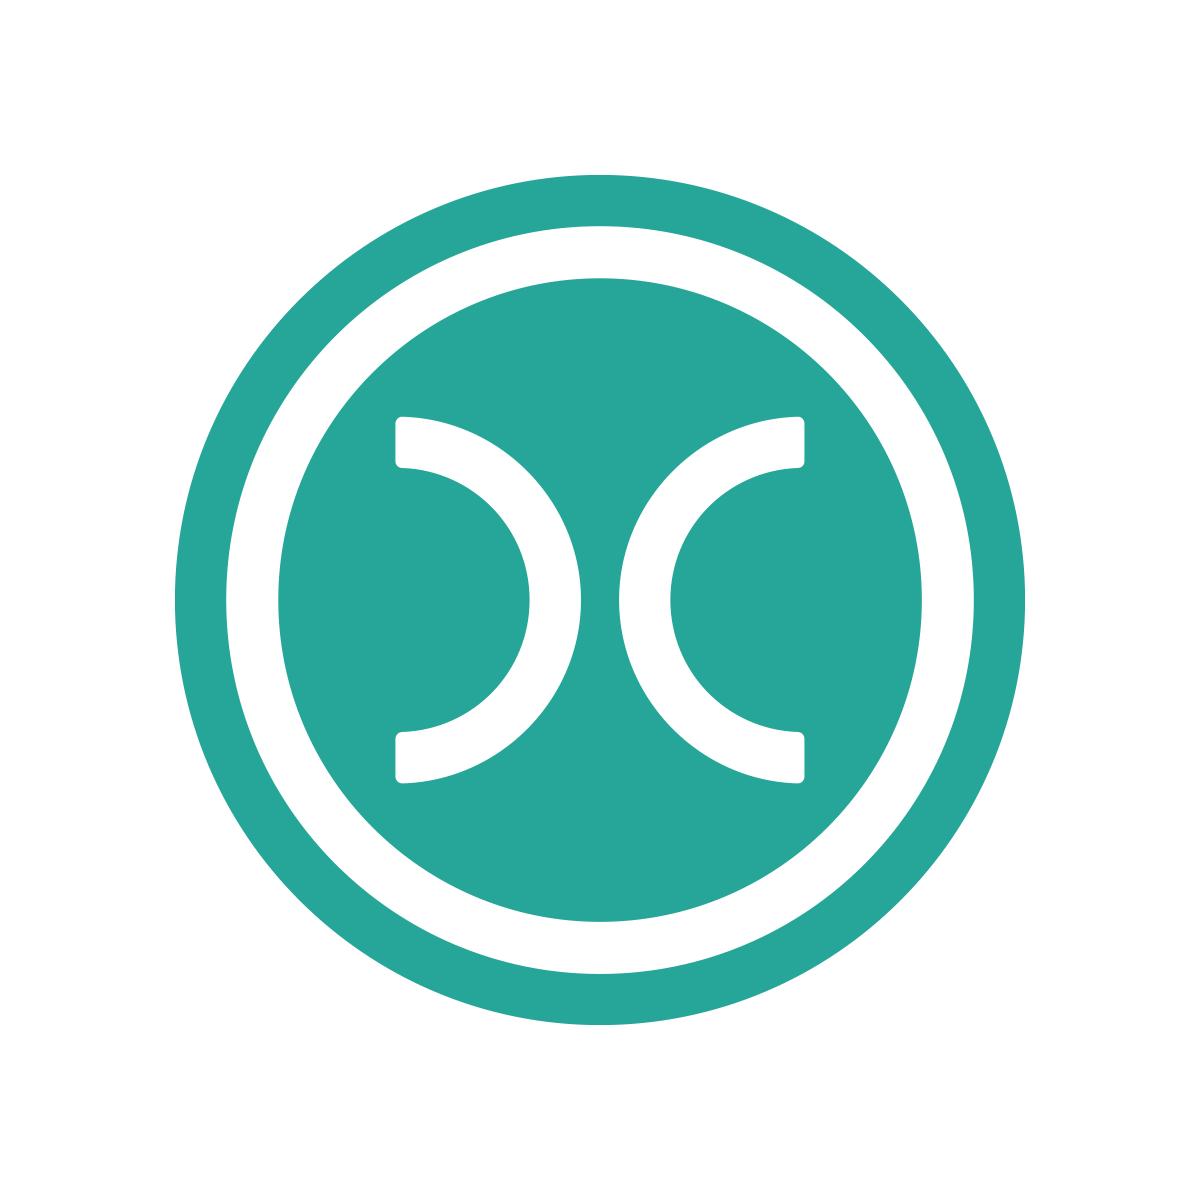 Oxide Design Co. on LogoLounge